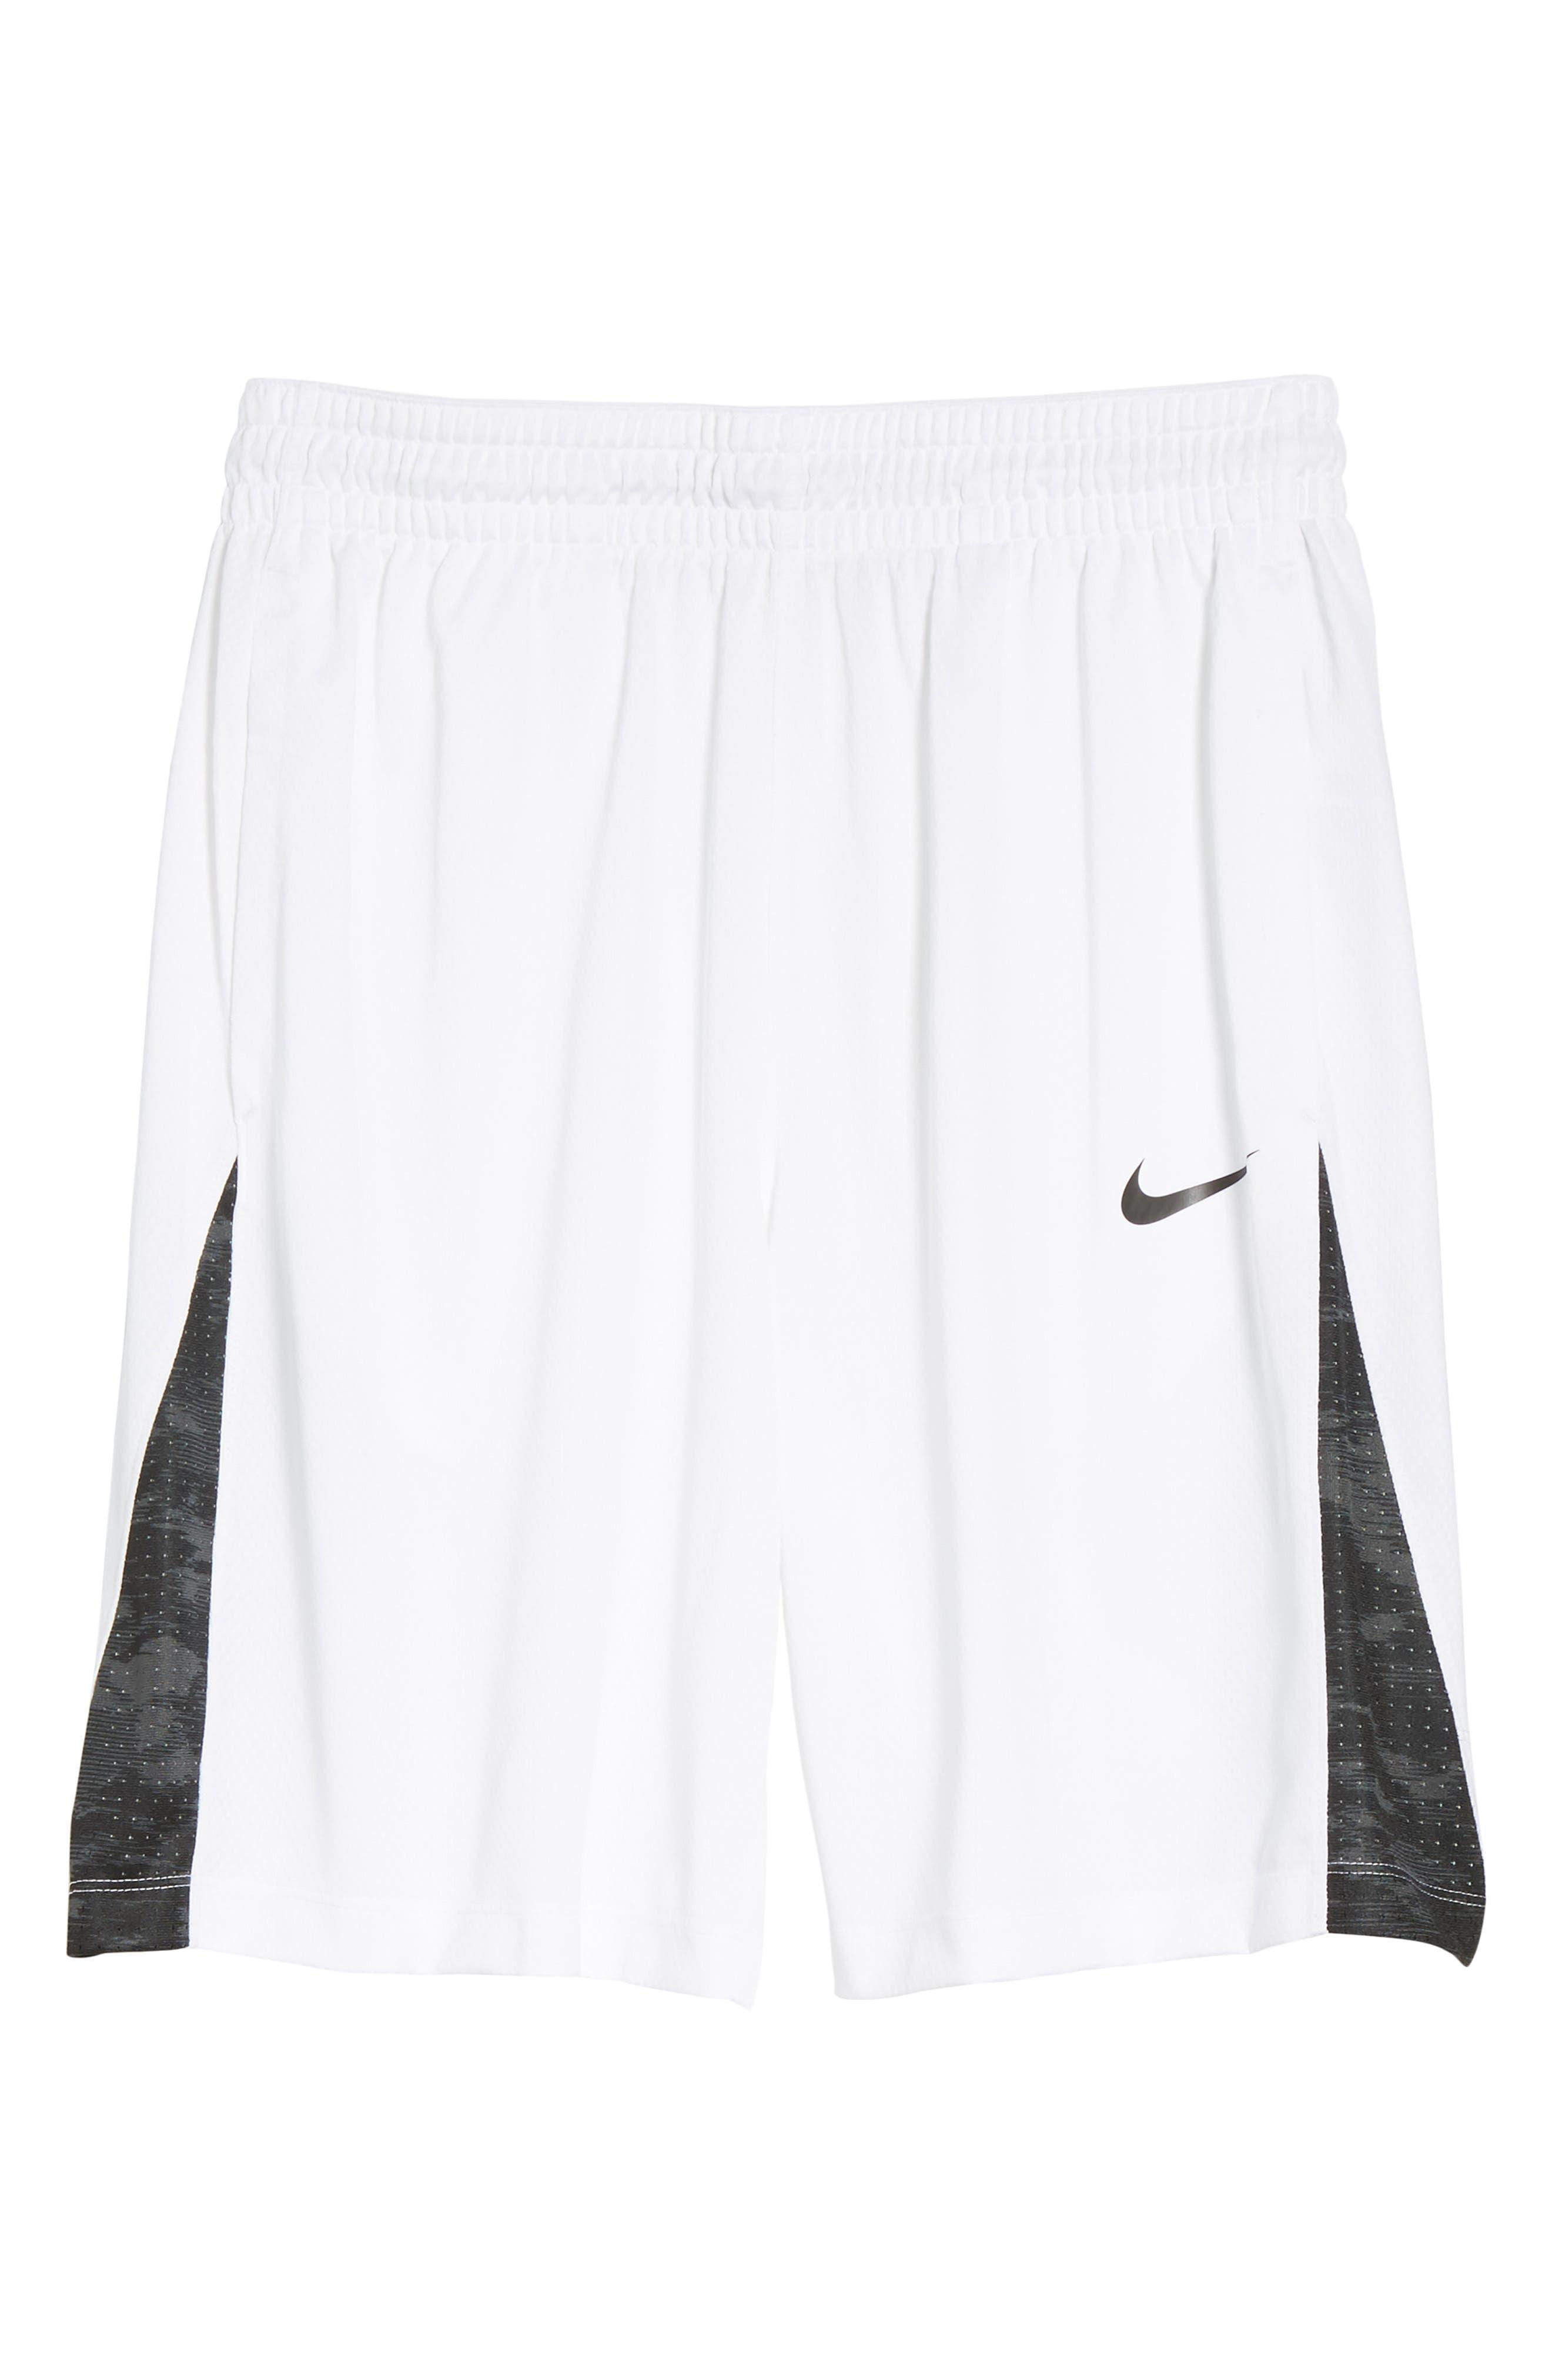 Alternate Image 1 Selected - Nike Basketball Shorts